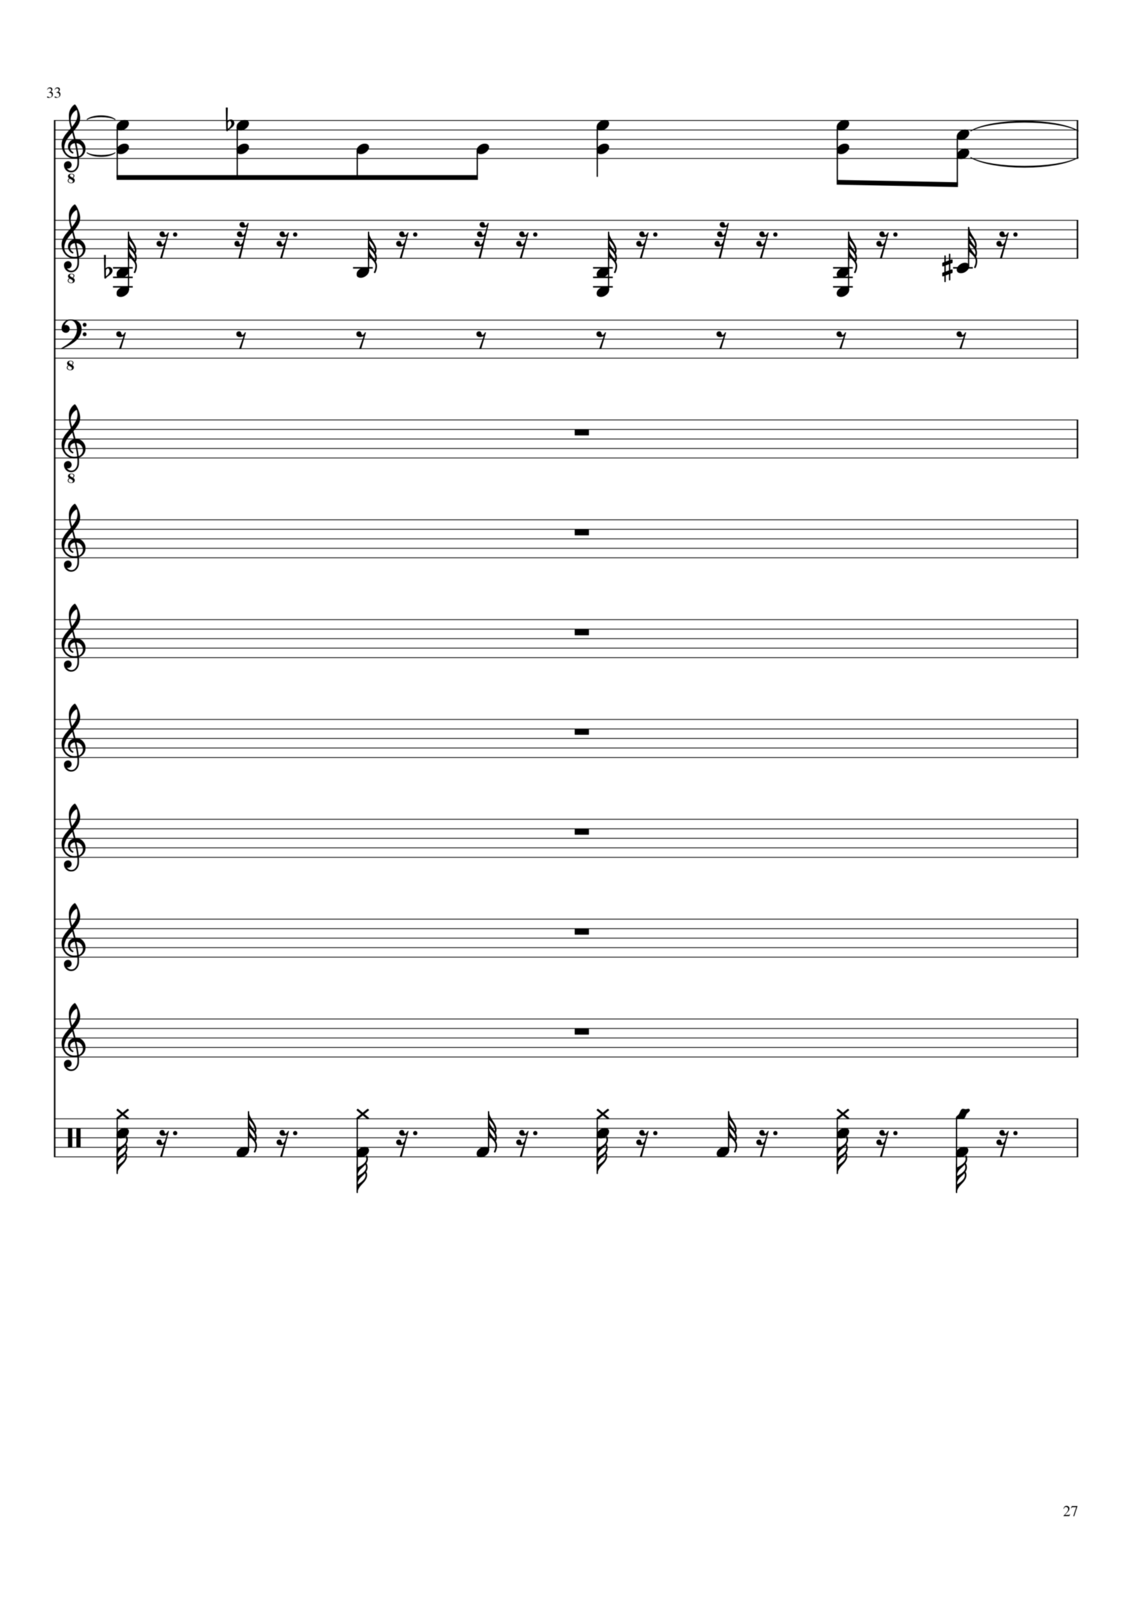 Belyiy sokol slide, Image 27